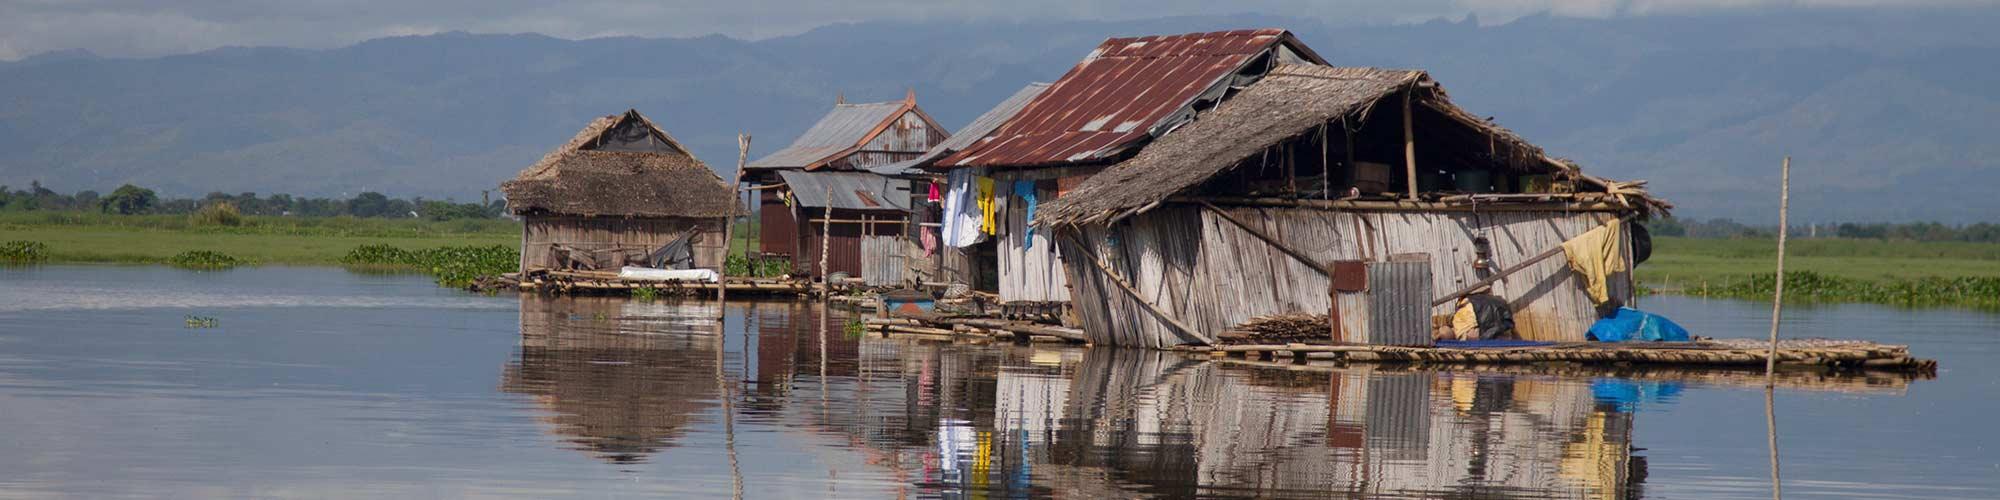 Casas flotantes Lago Tempe - El Pais Viajes